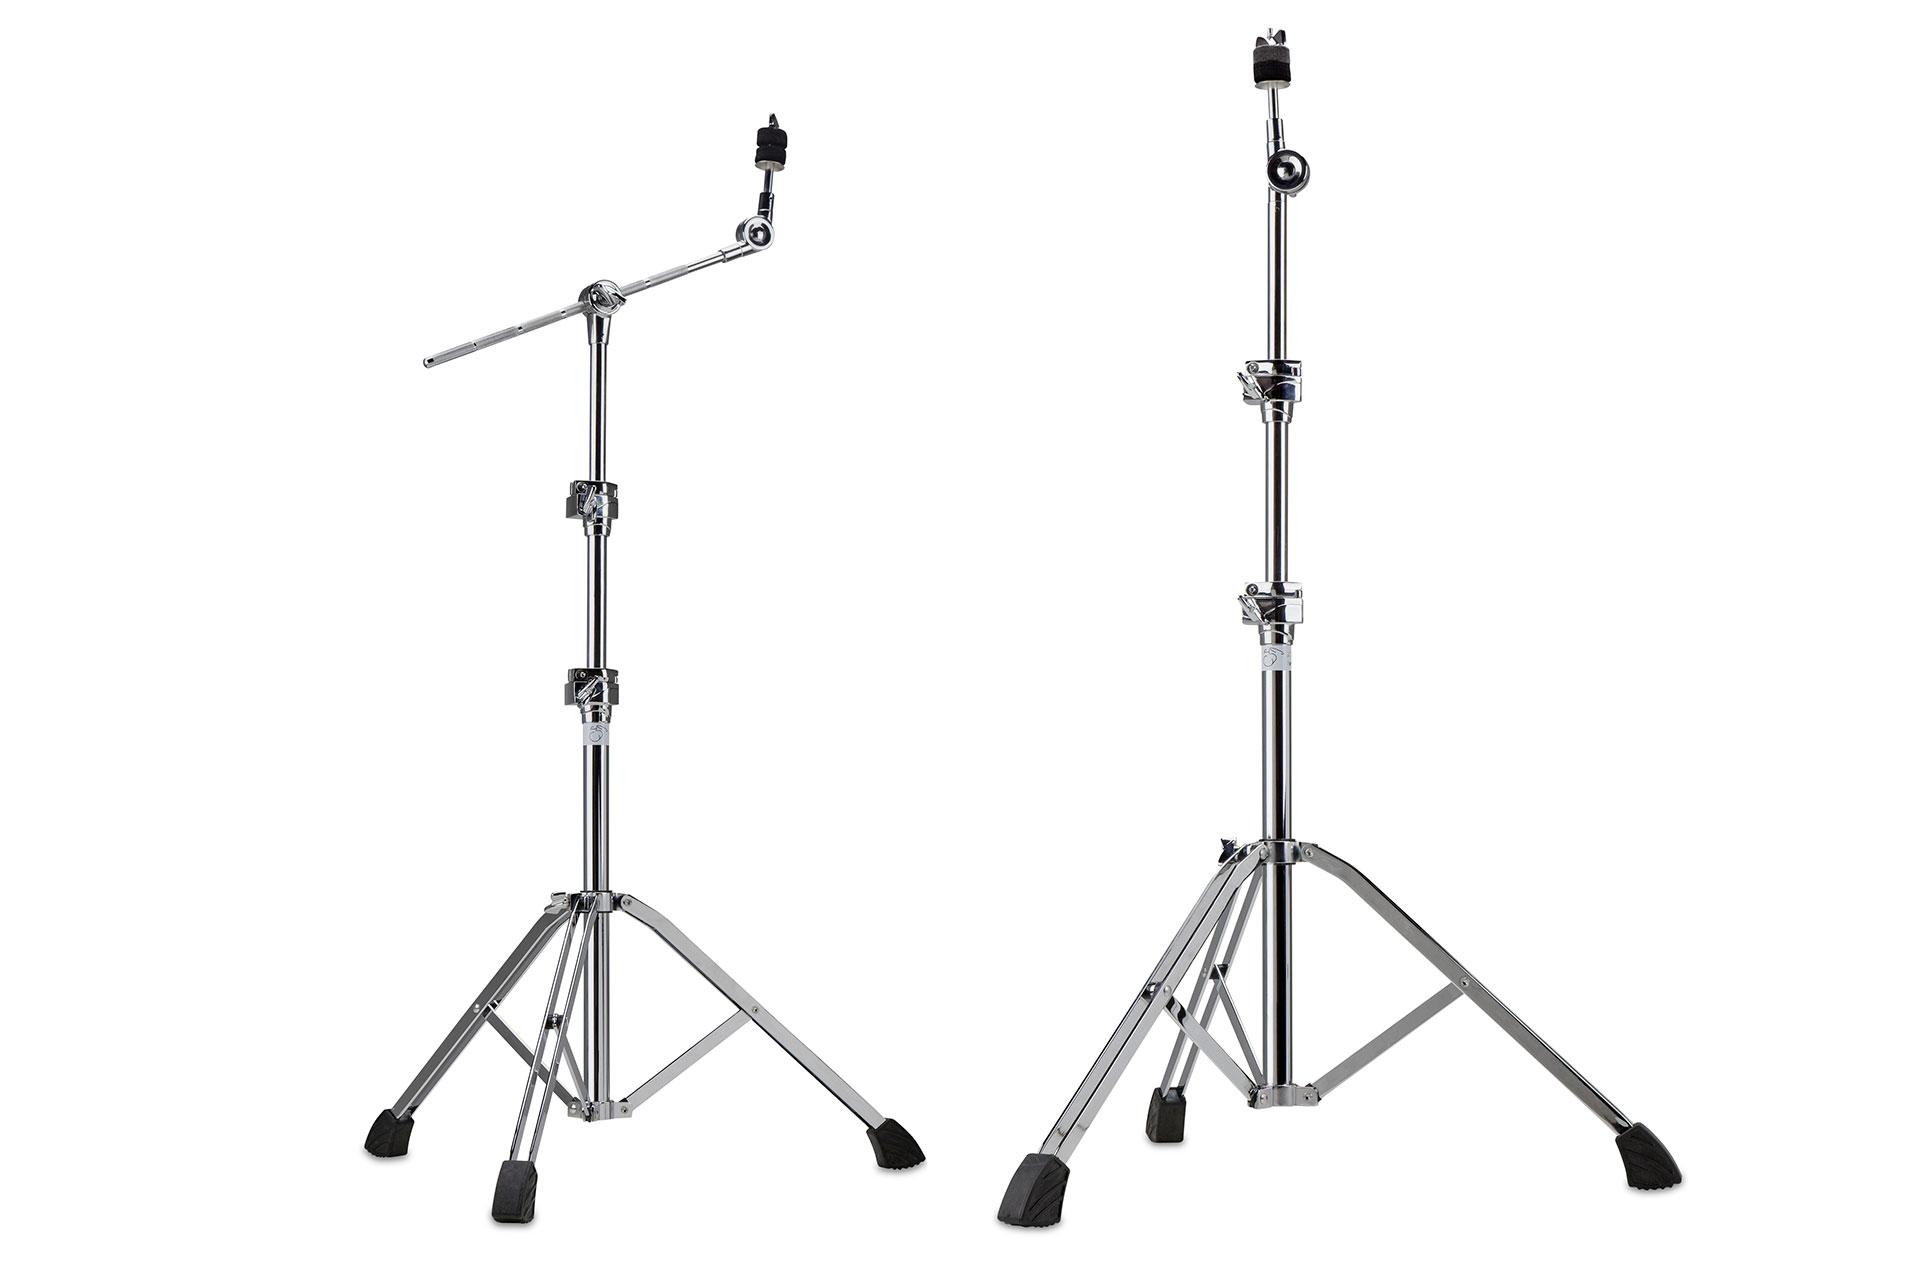 ferragens-fluence-pedestal